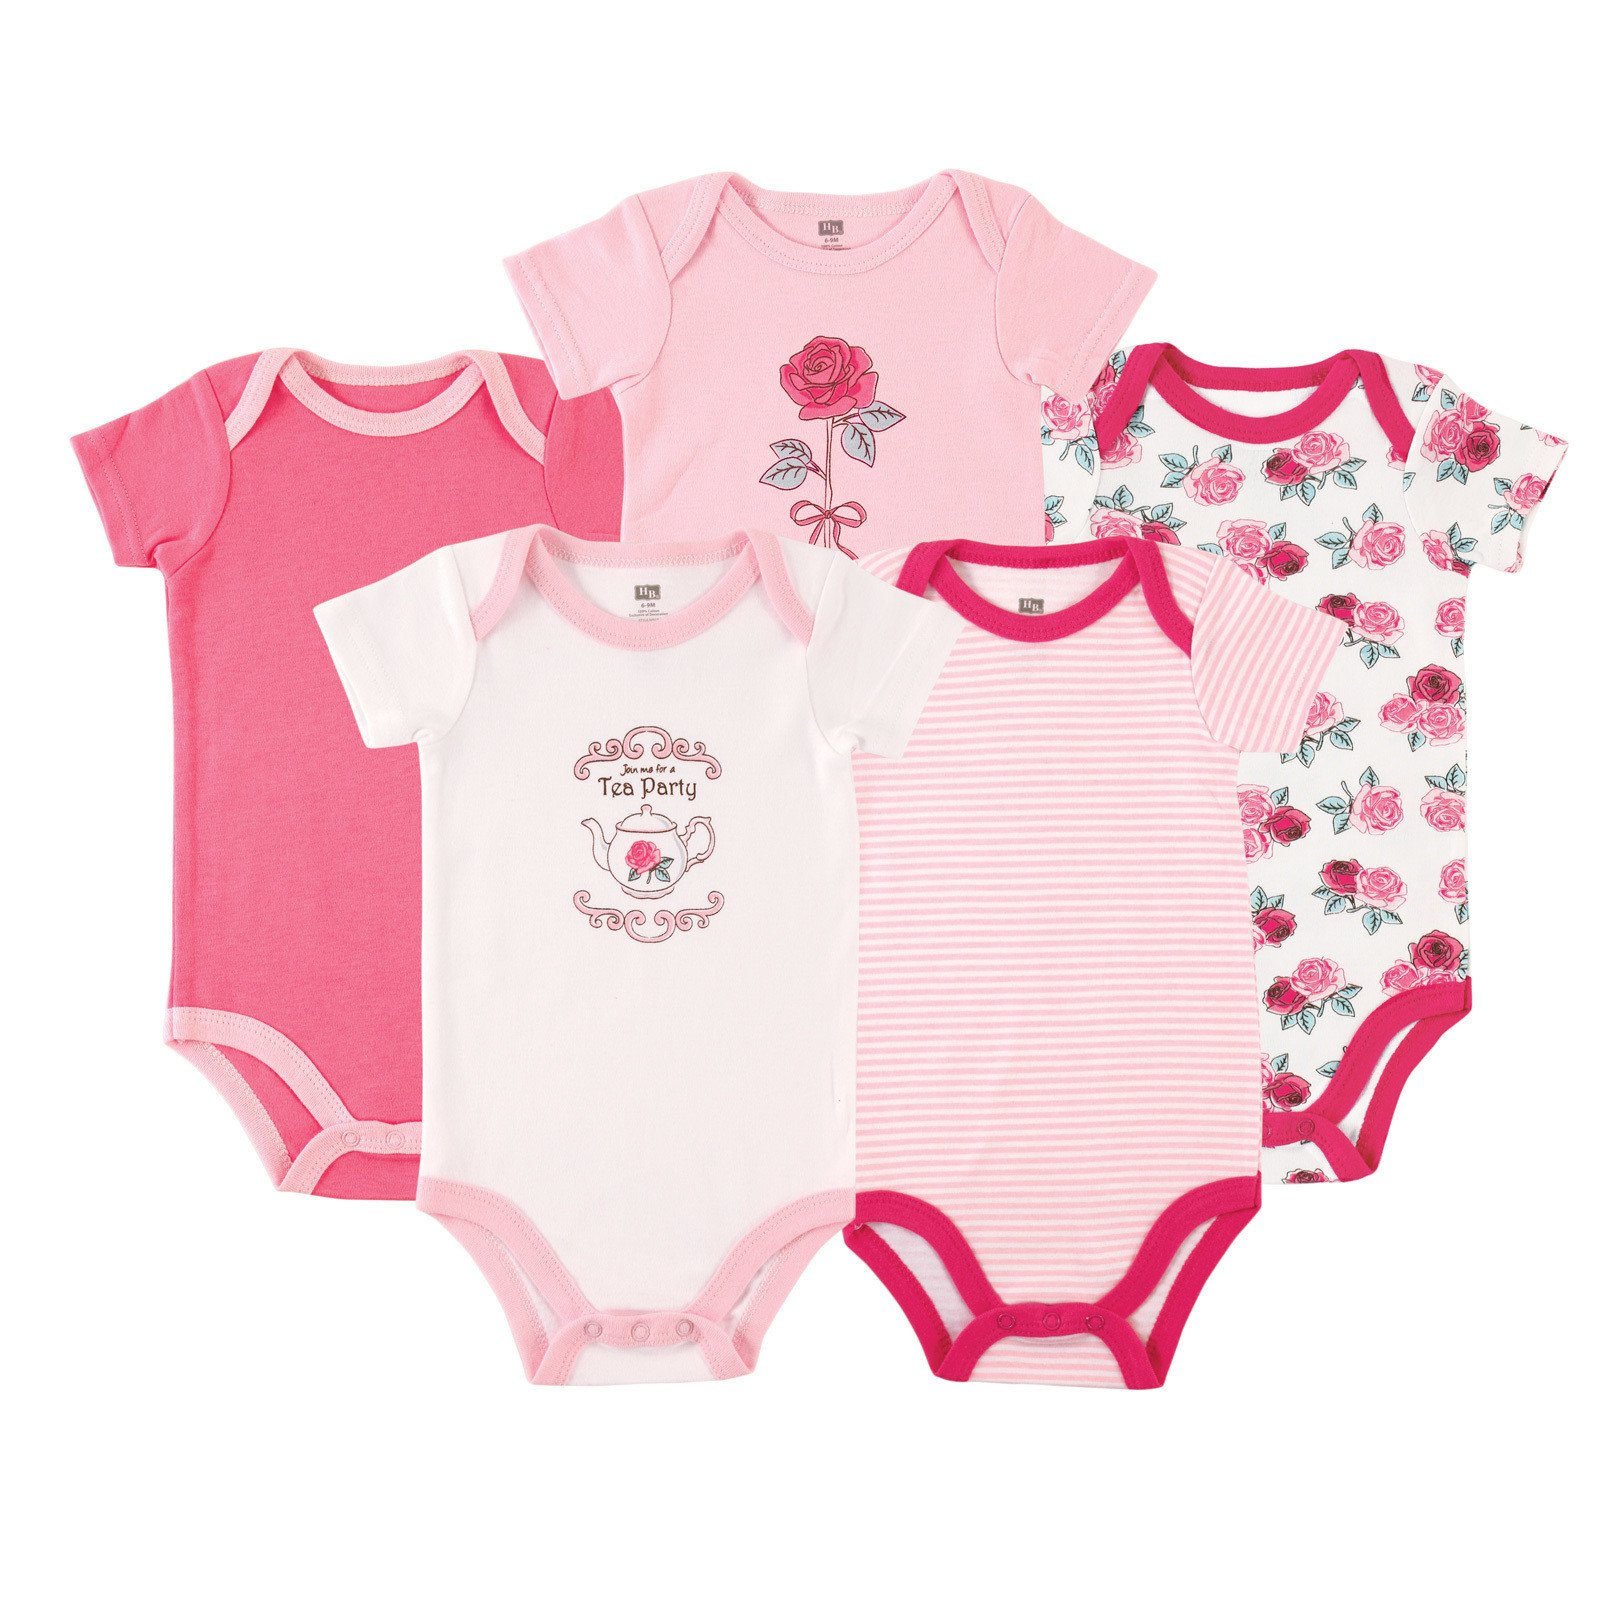 Hudson Baby Infant Cotton Bodysuits 5 Pack Bodysuits Clothing